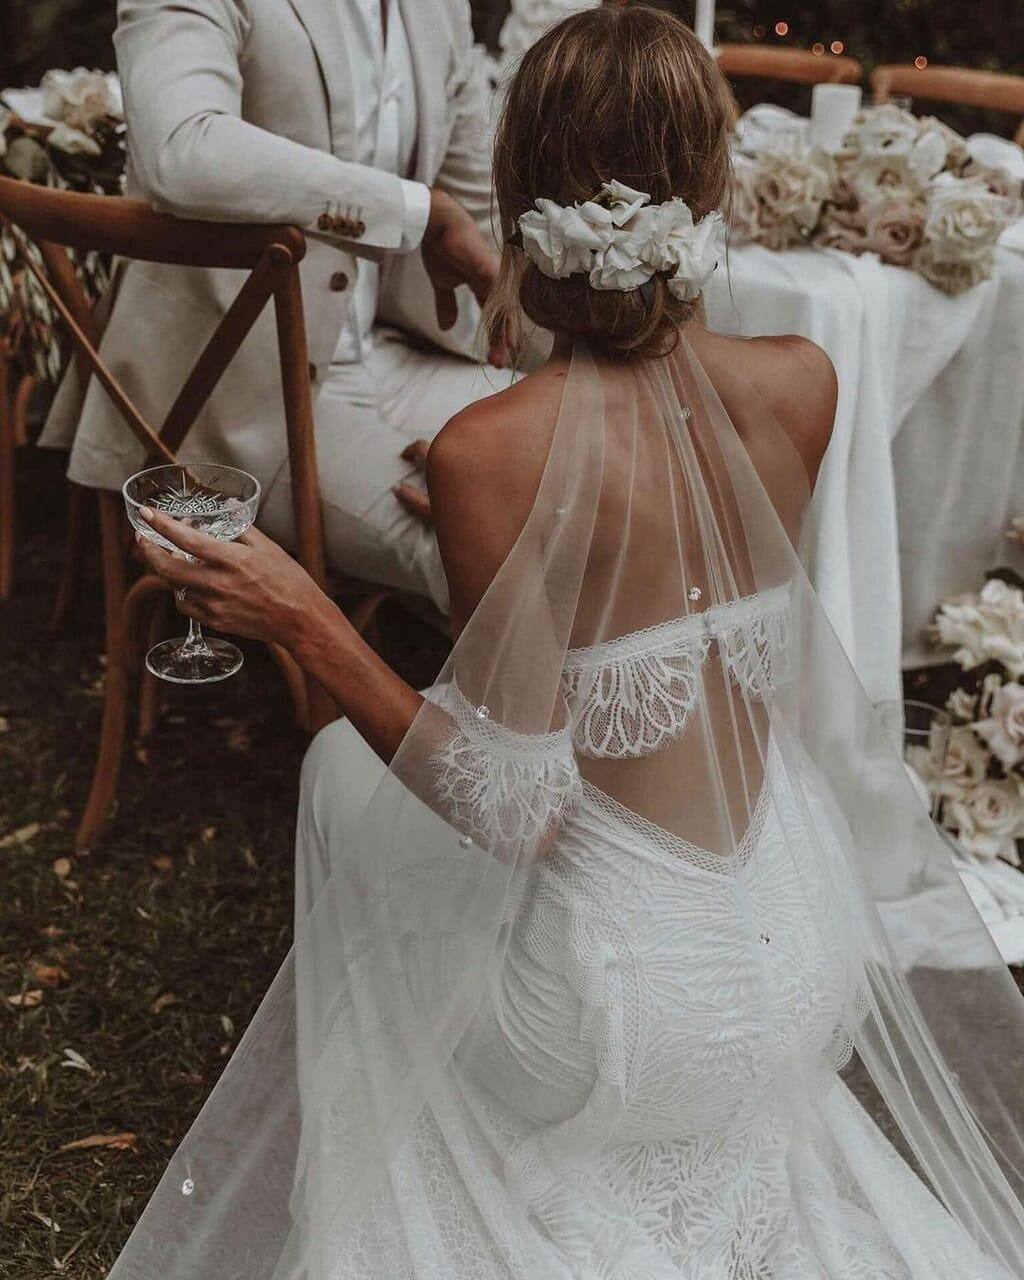 wedding decor, wedding plan, and couple goals image